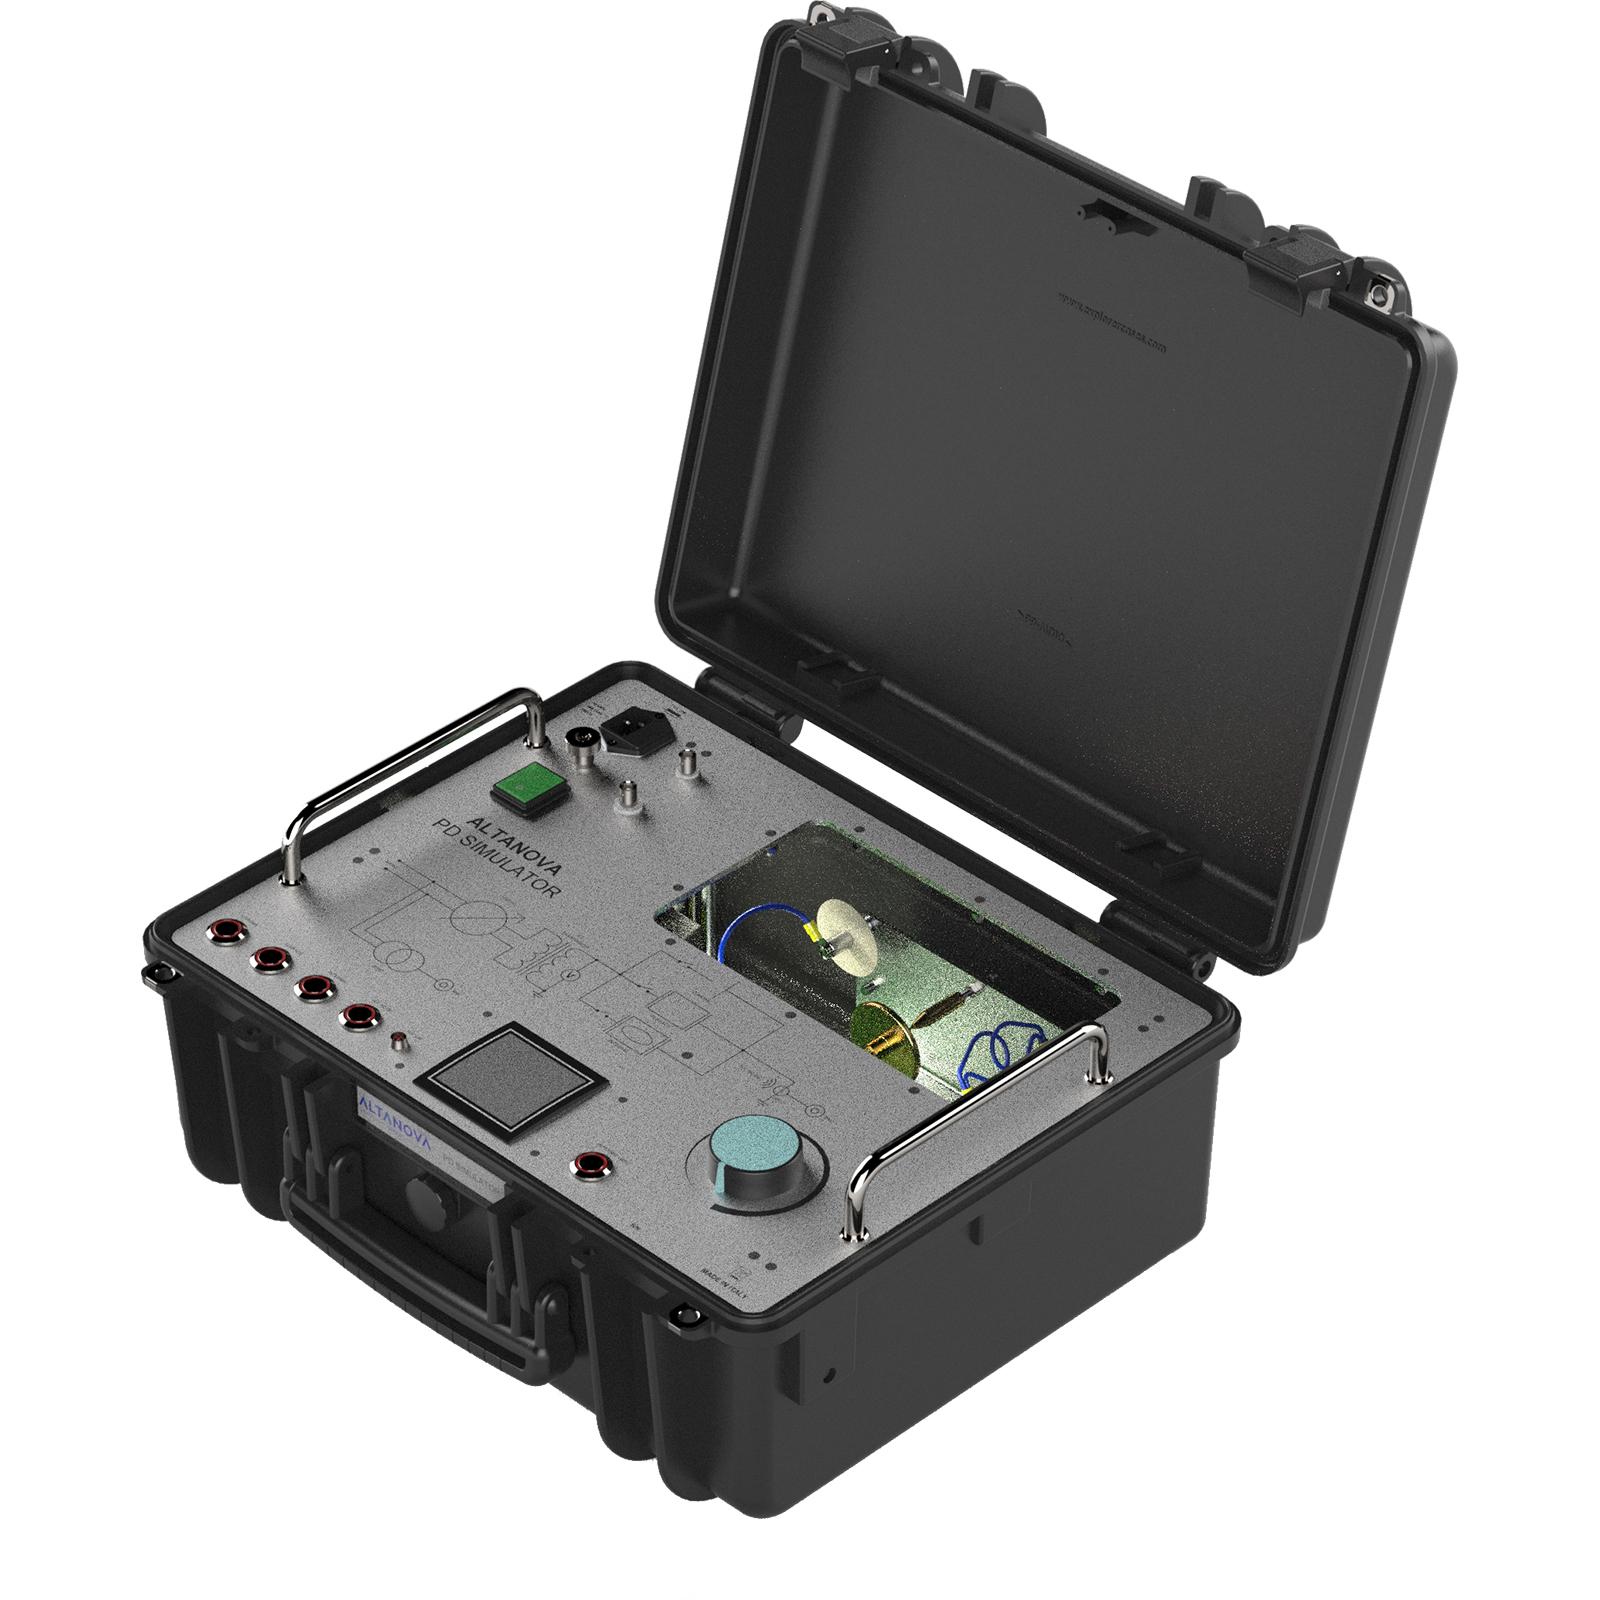 PD Simulator|Partial Discharge Simulator